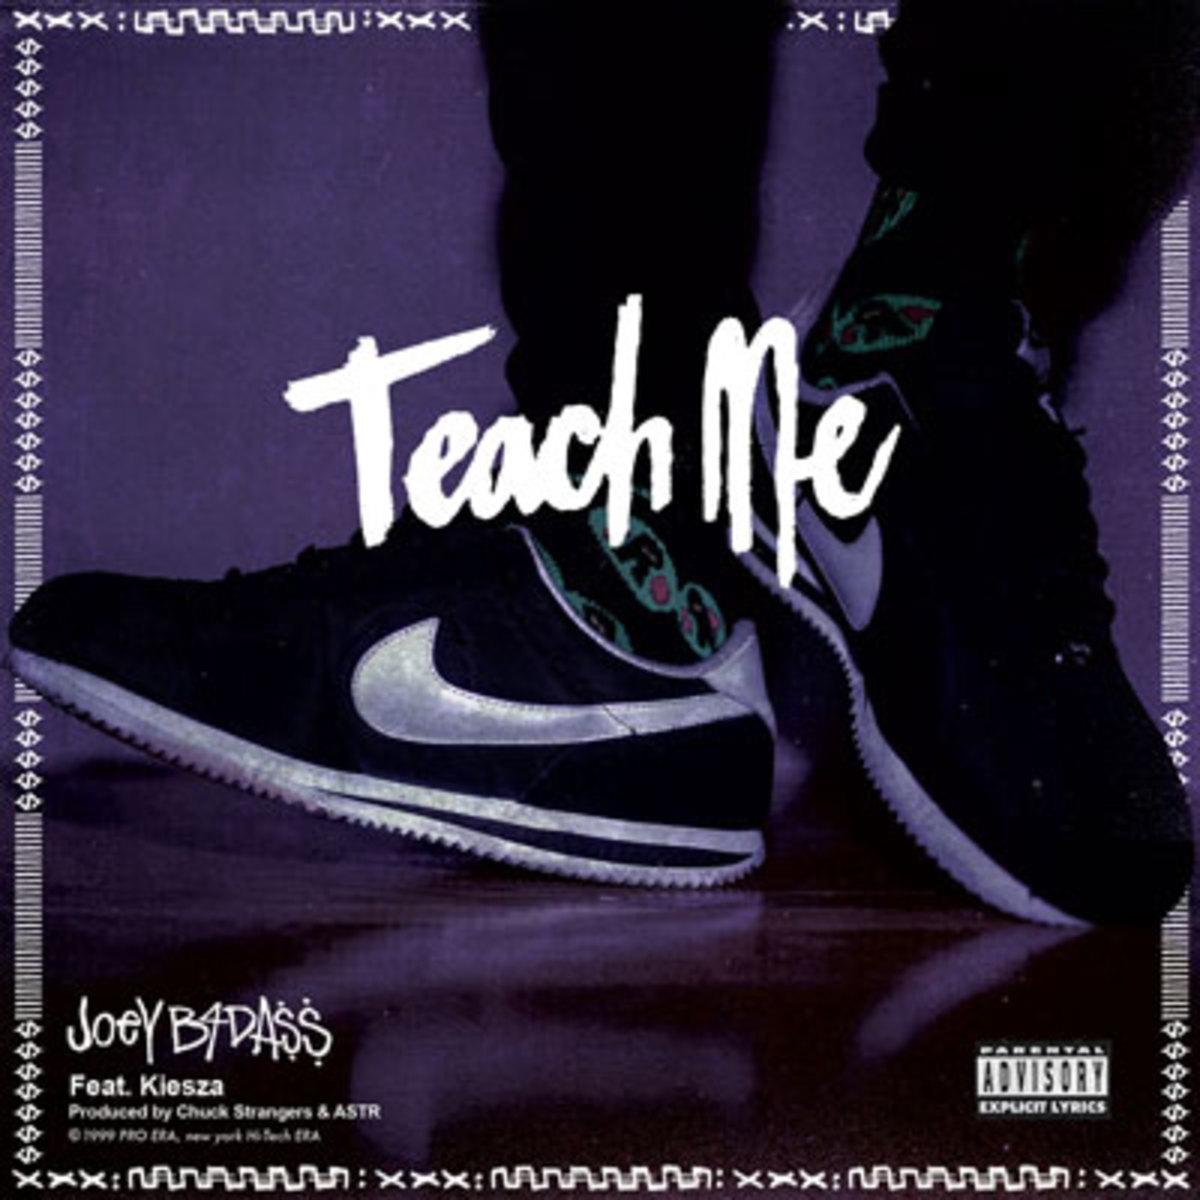 joeybadass-teachme.jpg